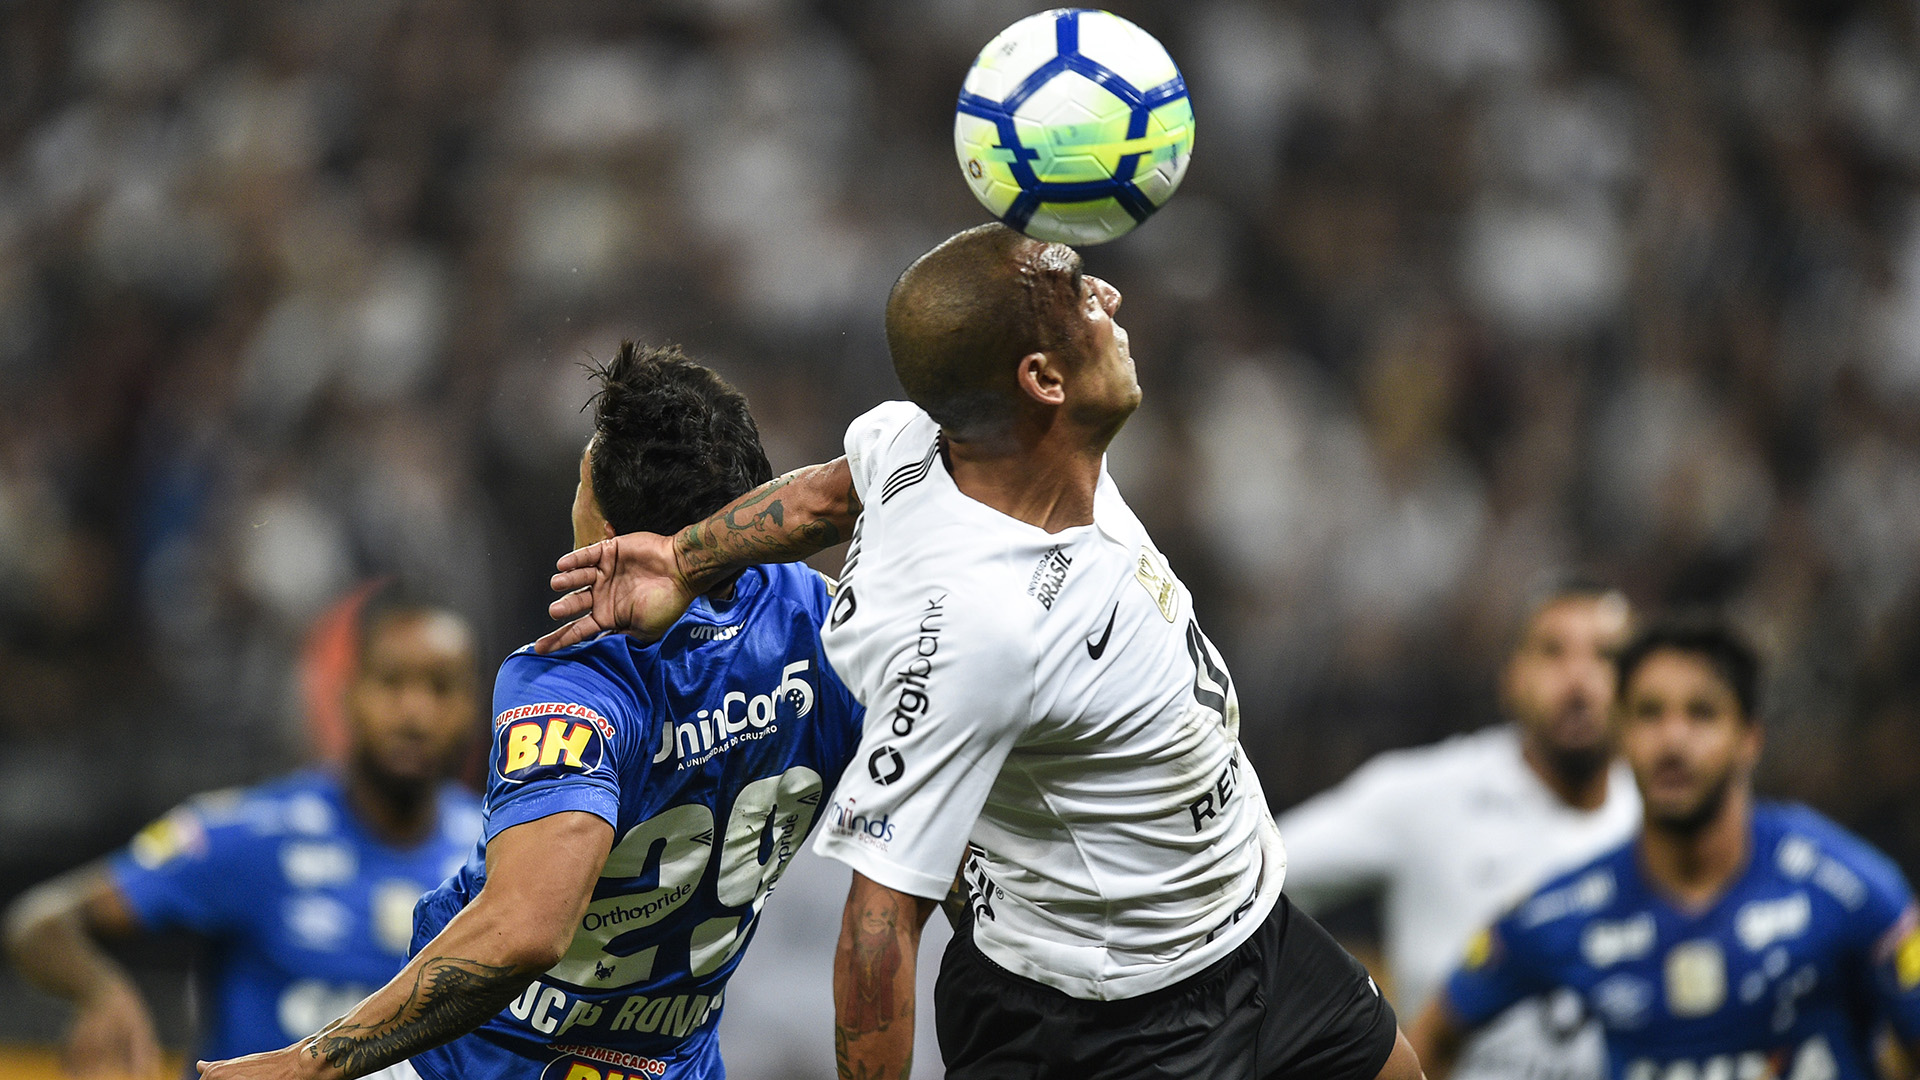 Emerson Sheik Lucas Romero Corinthians Cruzeiro Copa do Brasil 17102018